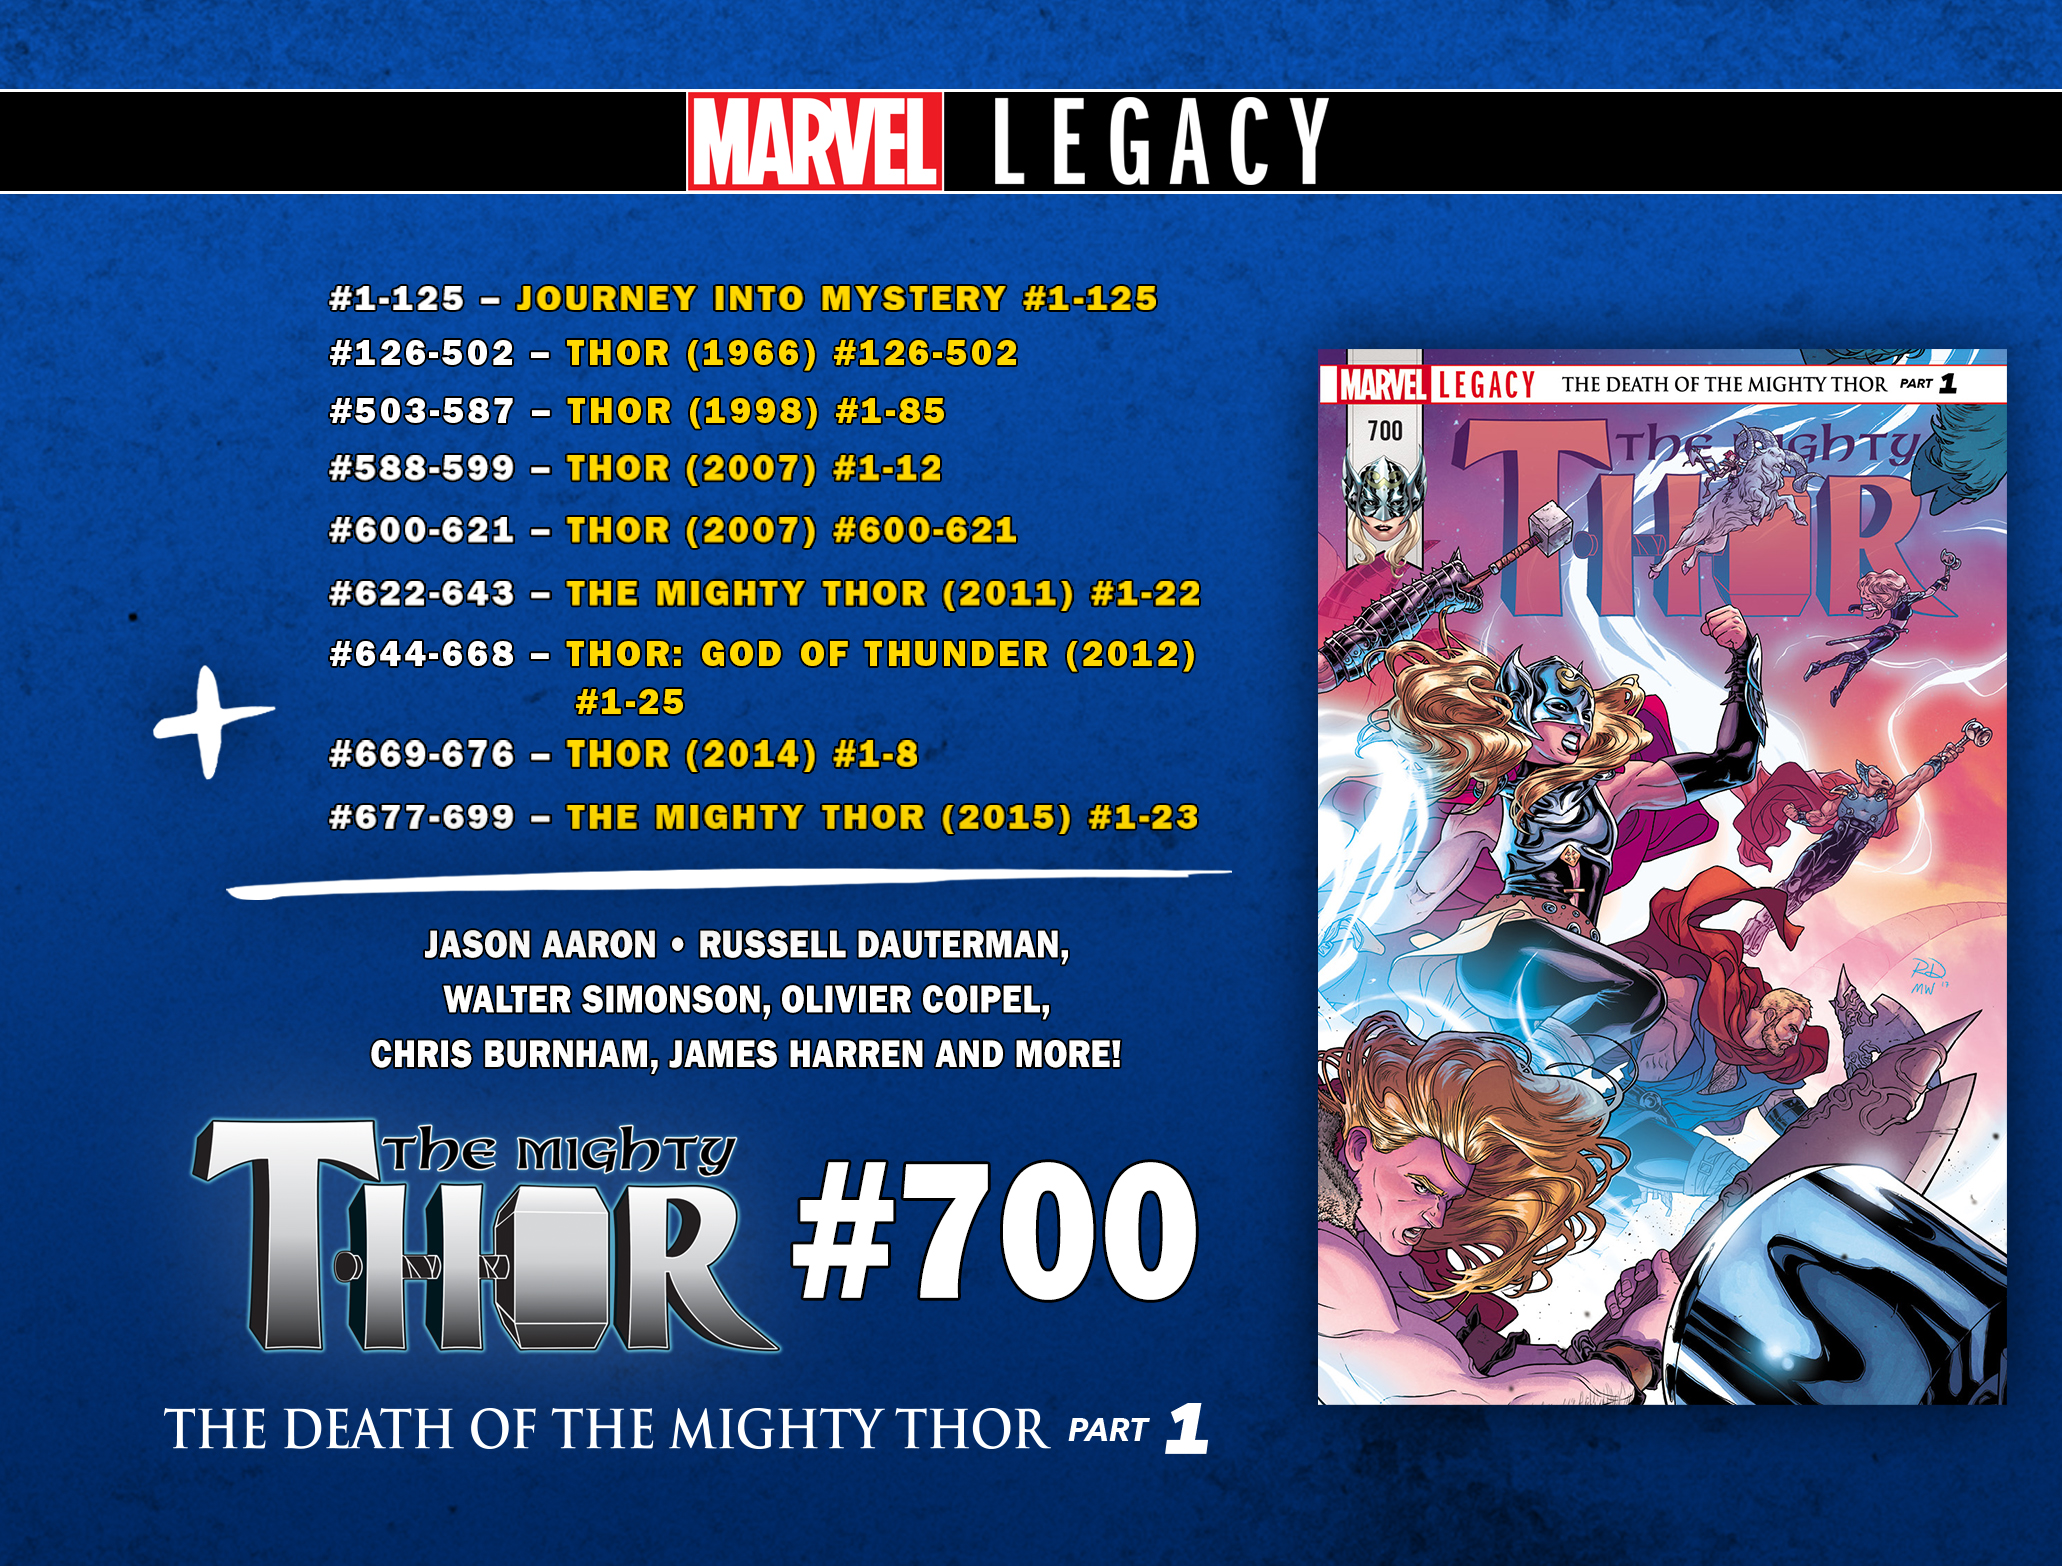 Thor #700